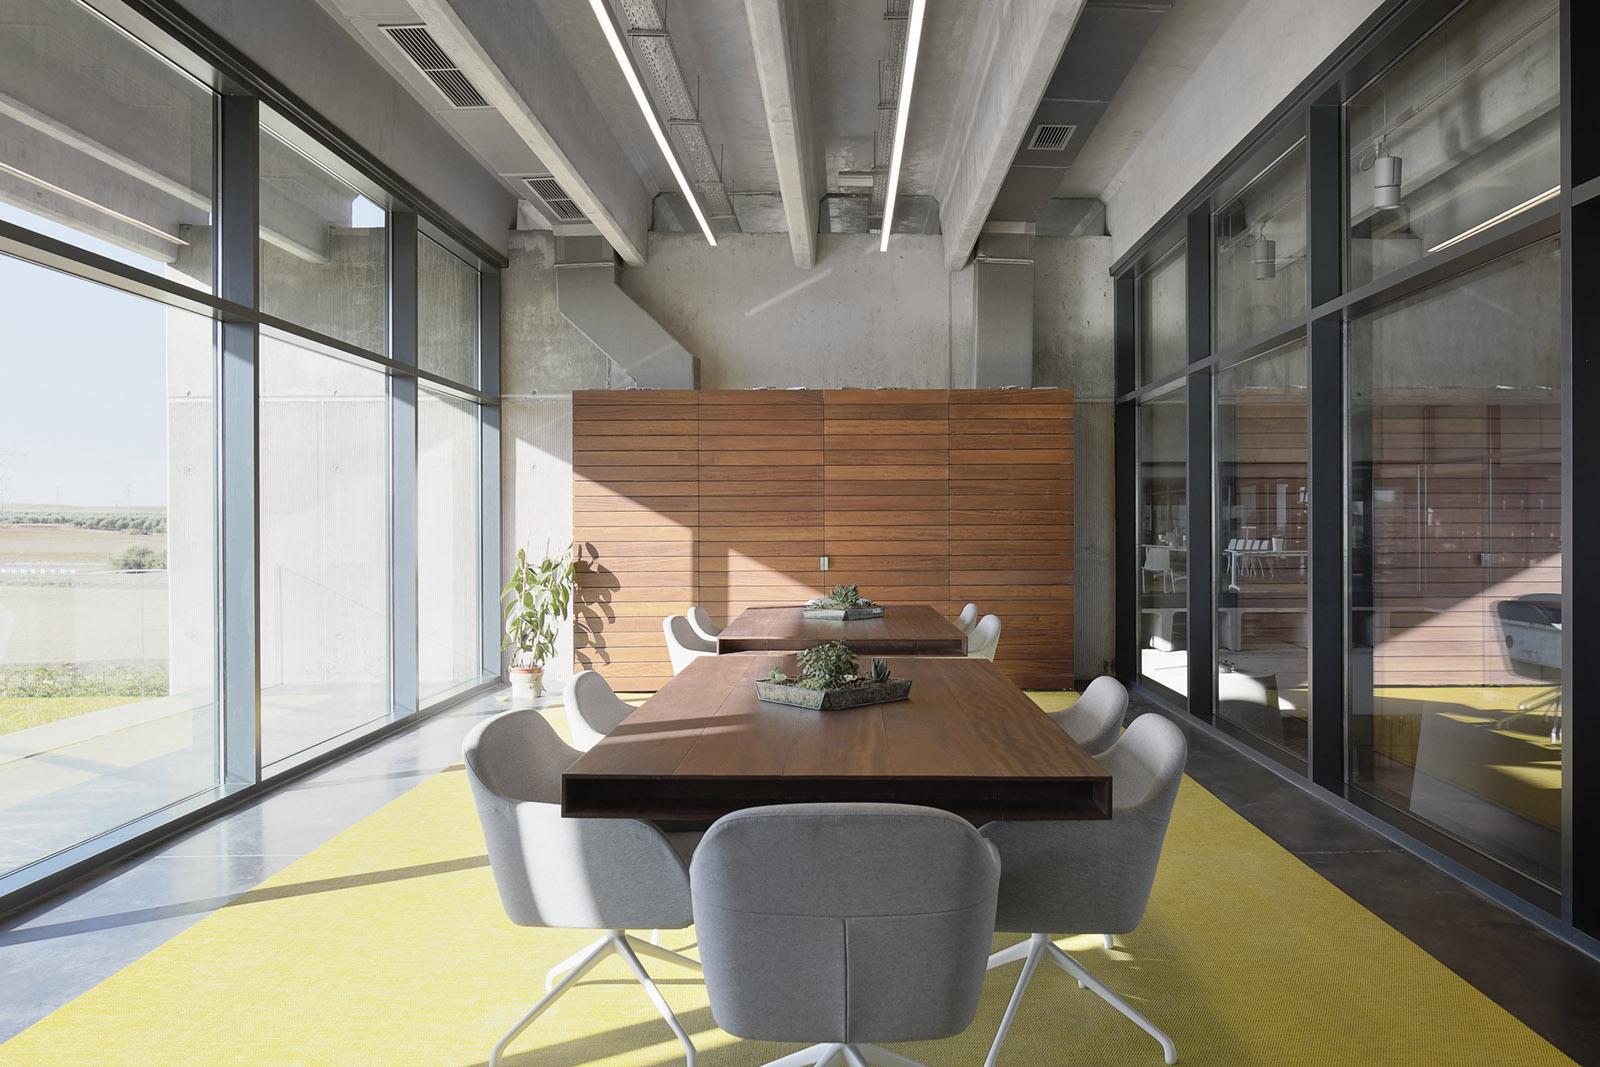 Architectural710-Interior-photographer-Madrid-Spain-.jpg